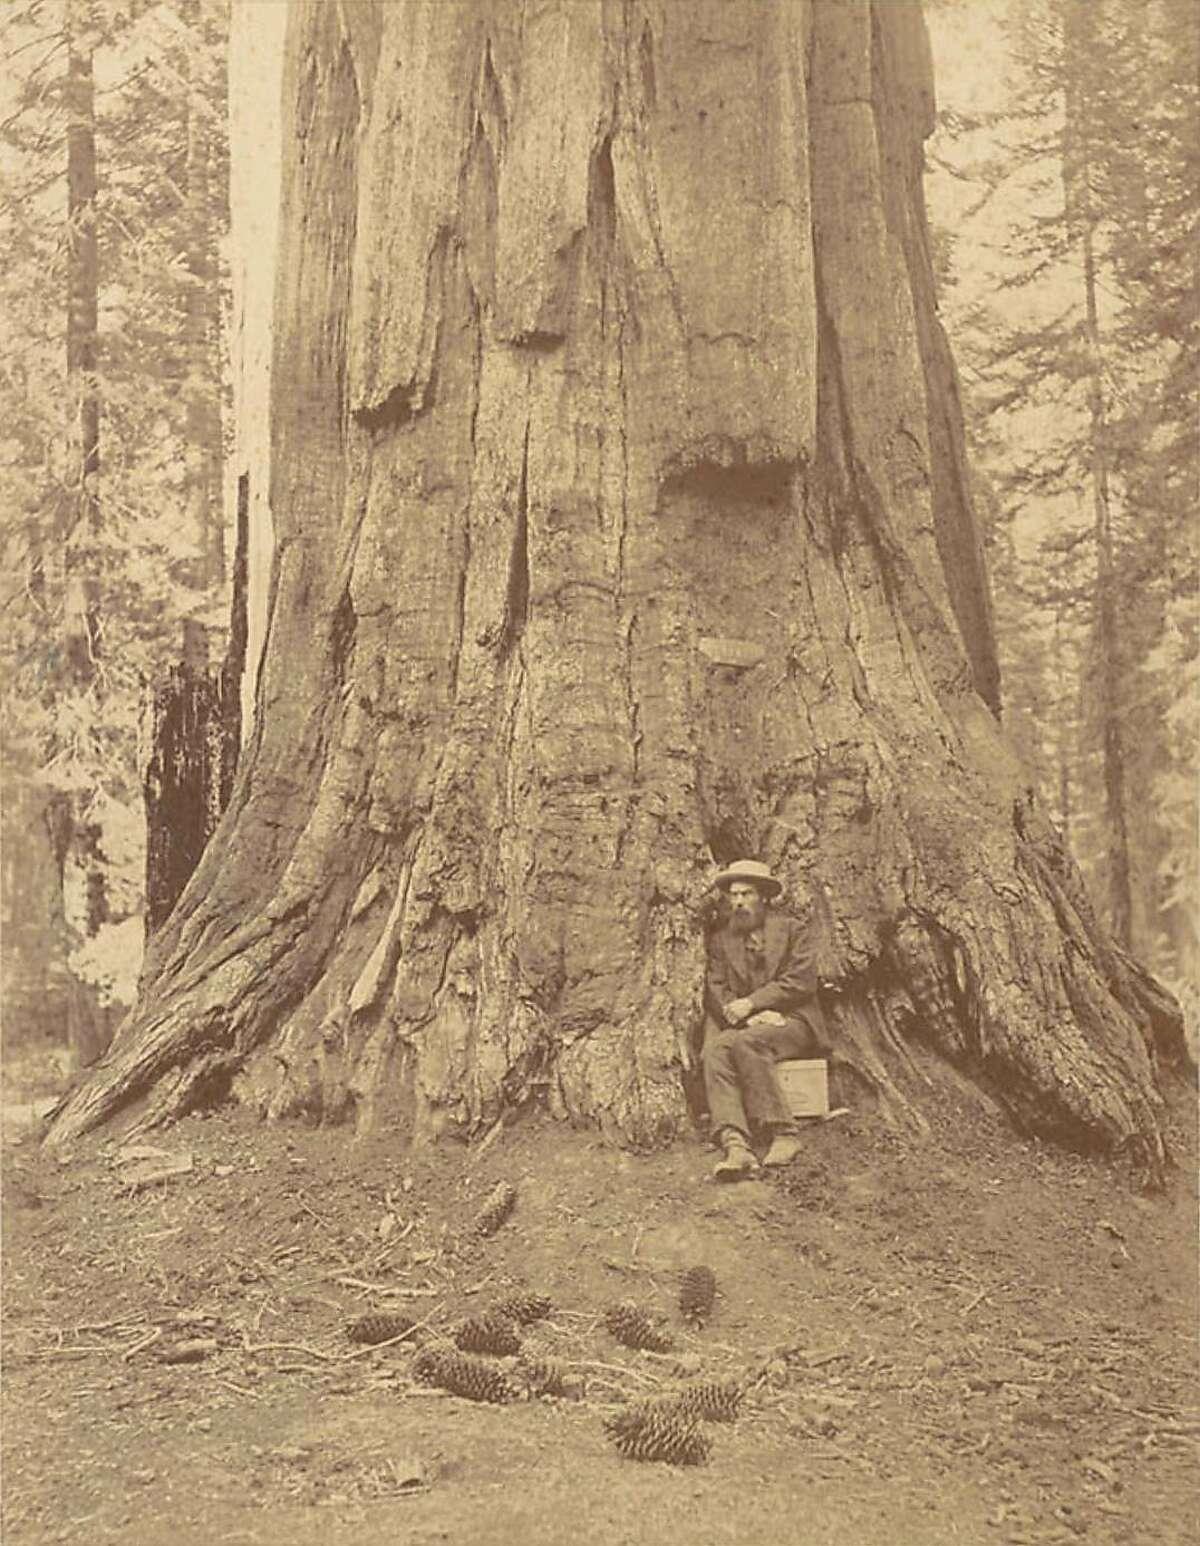 English photographer Eadweard Muybridge at the base of the�General Grant tree in Mariposa Grove in 1872.